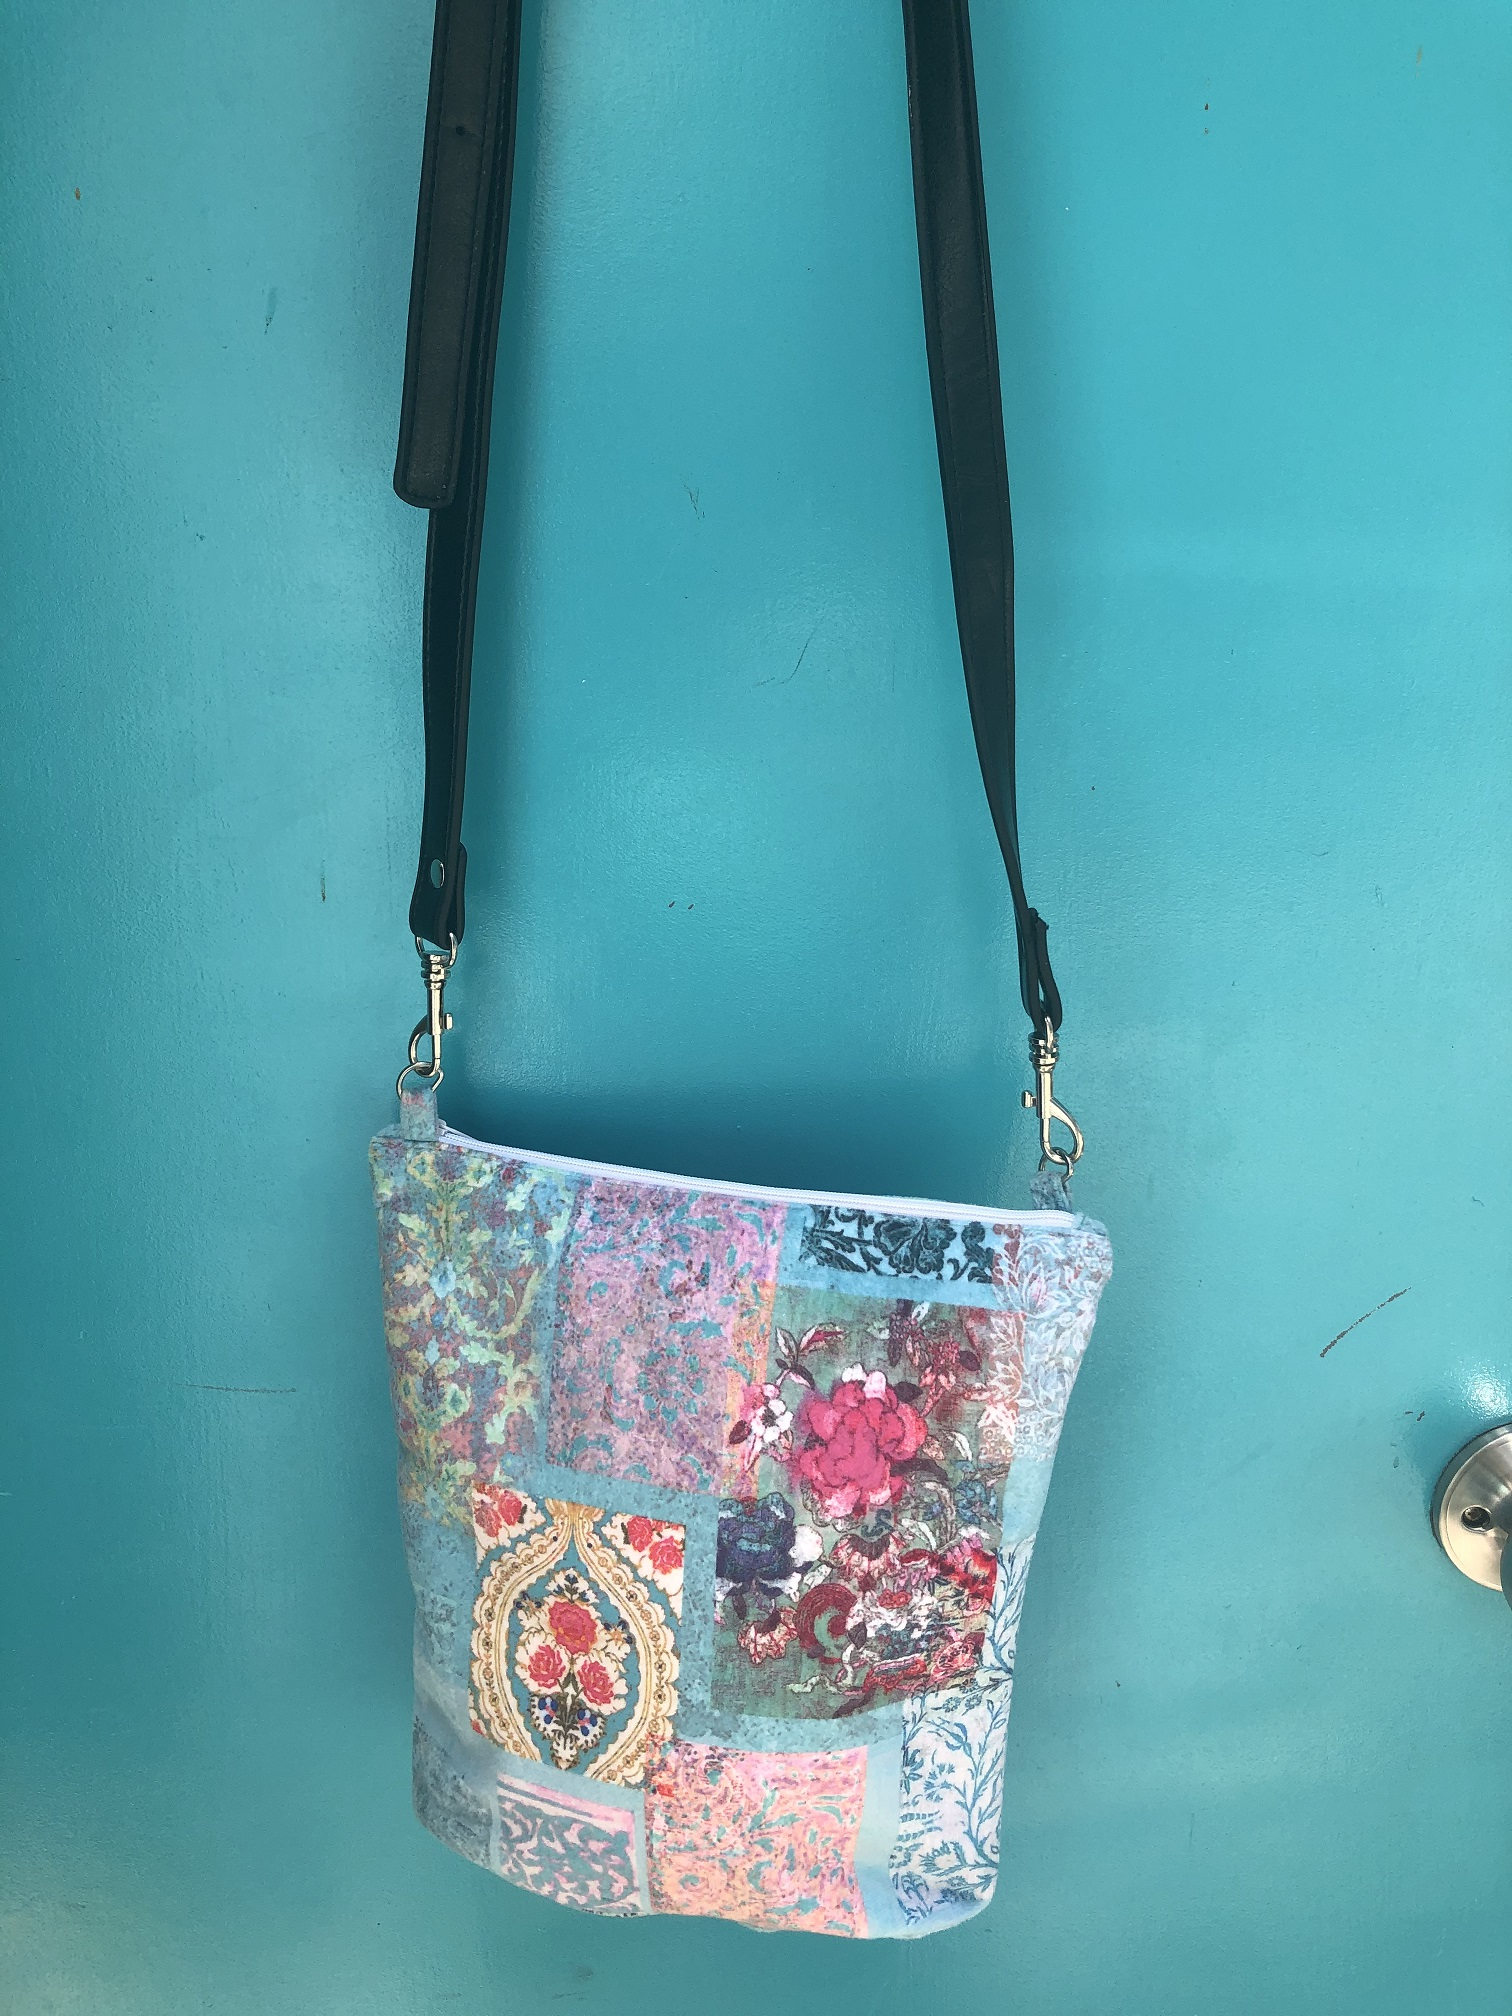 Velvet Bag in Venezia Turquoise